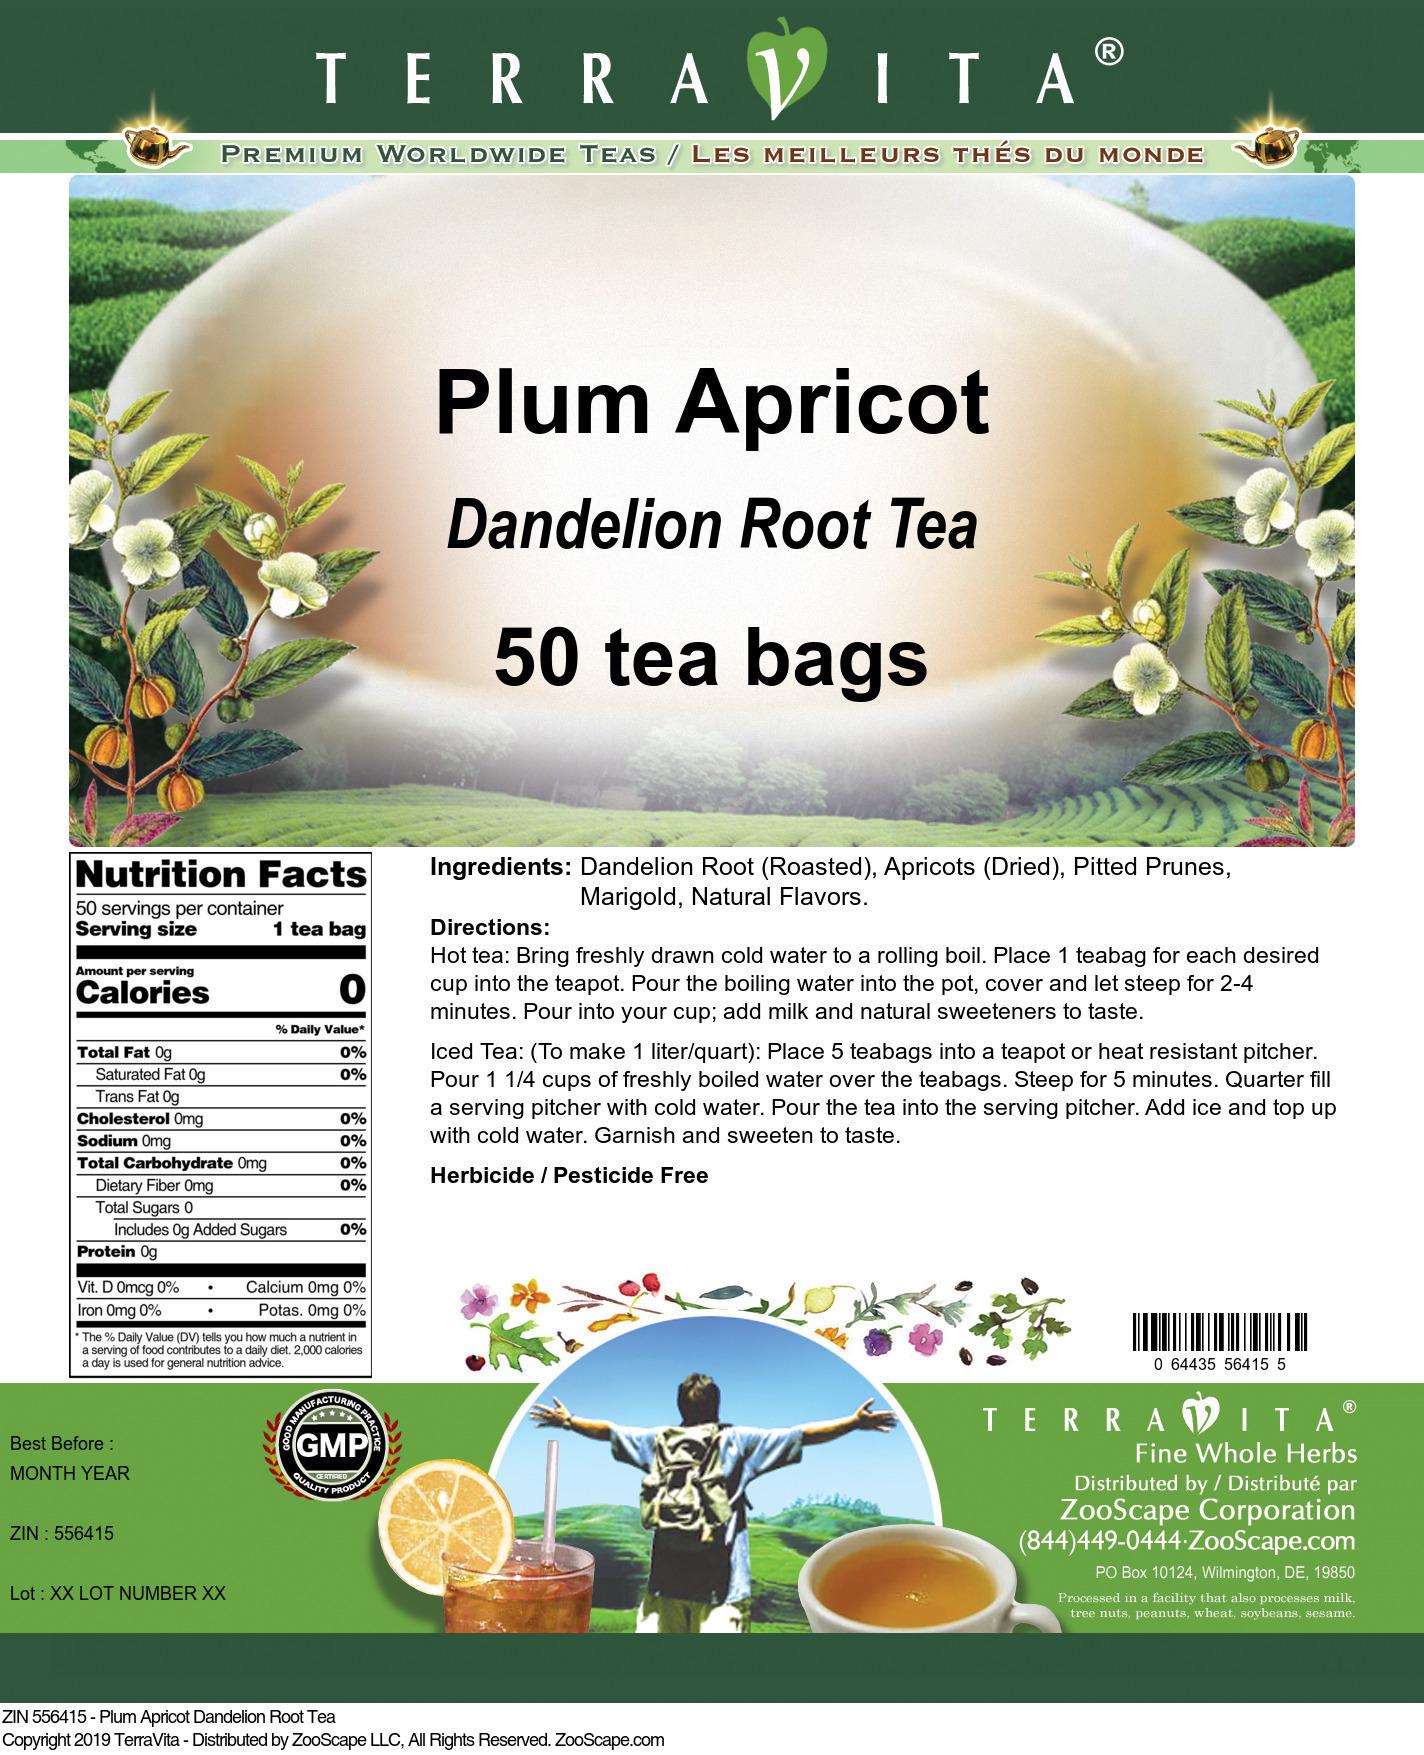 Plum Apricot Dandelion Root